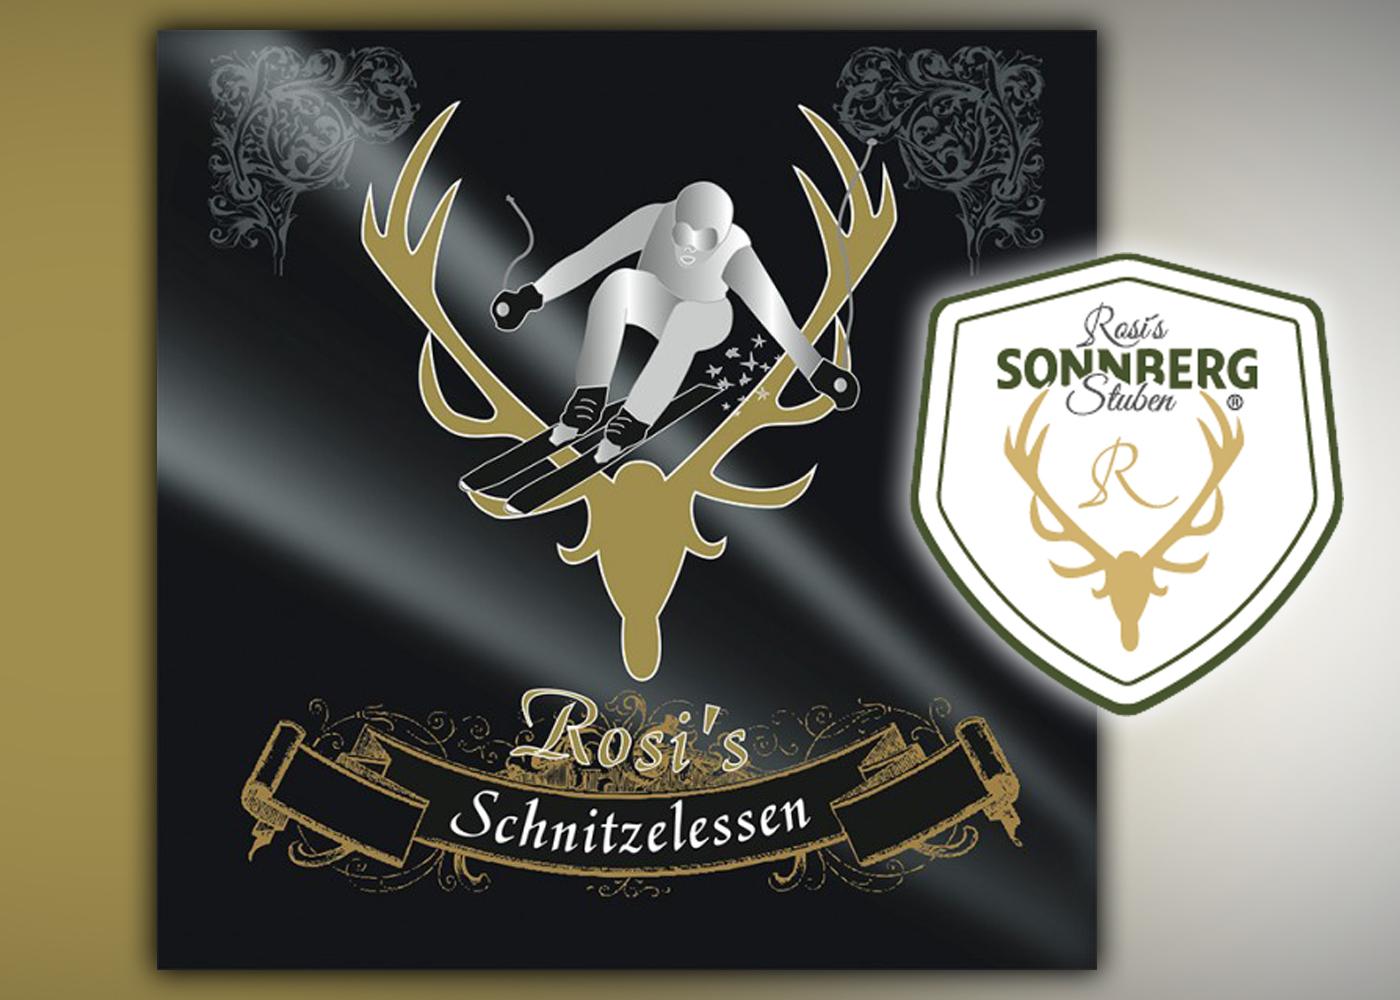 Salzburg-Cityguide - Newsfoto - ok_rosis_schnitzelessen_2019.jpg